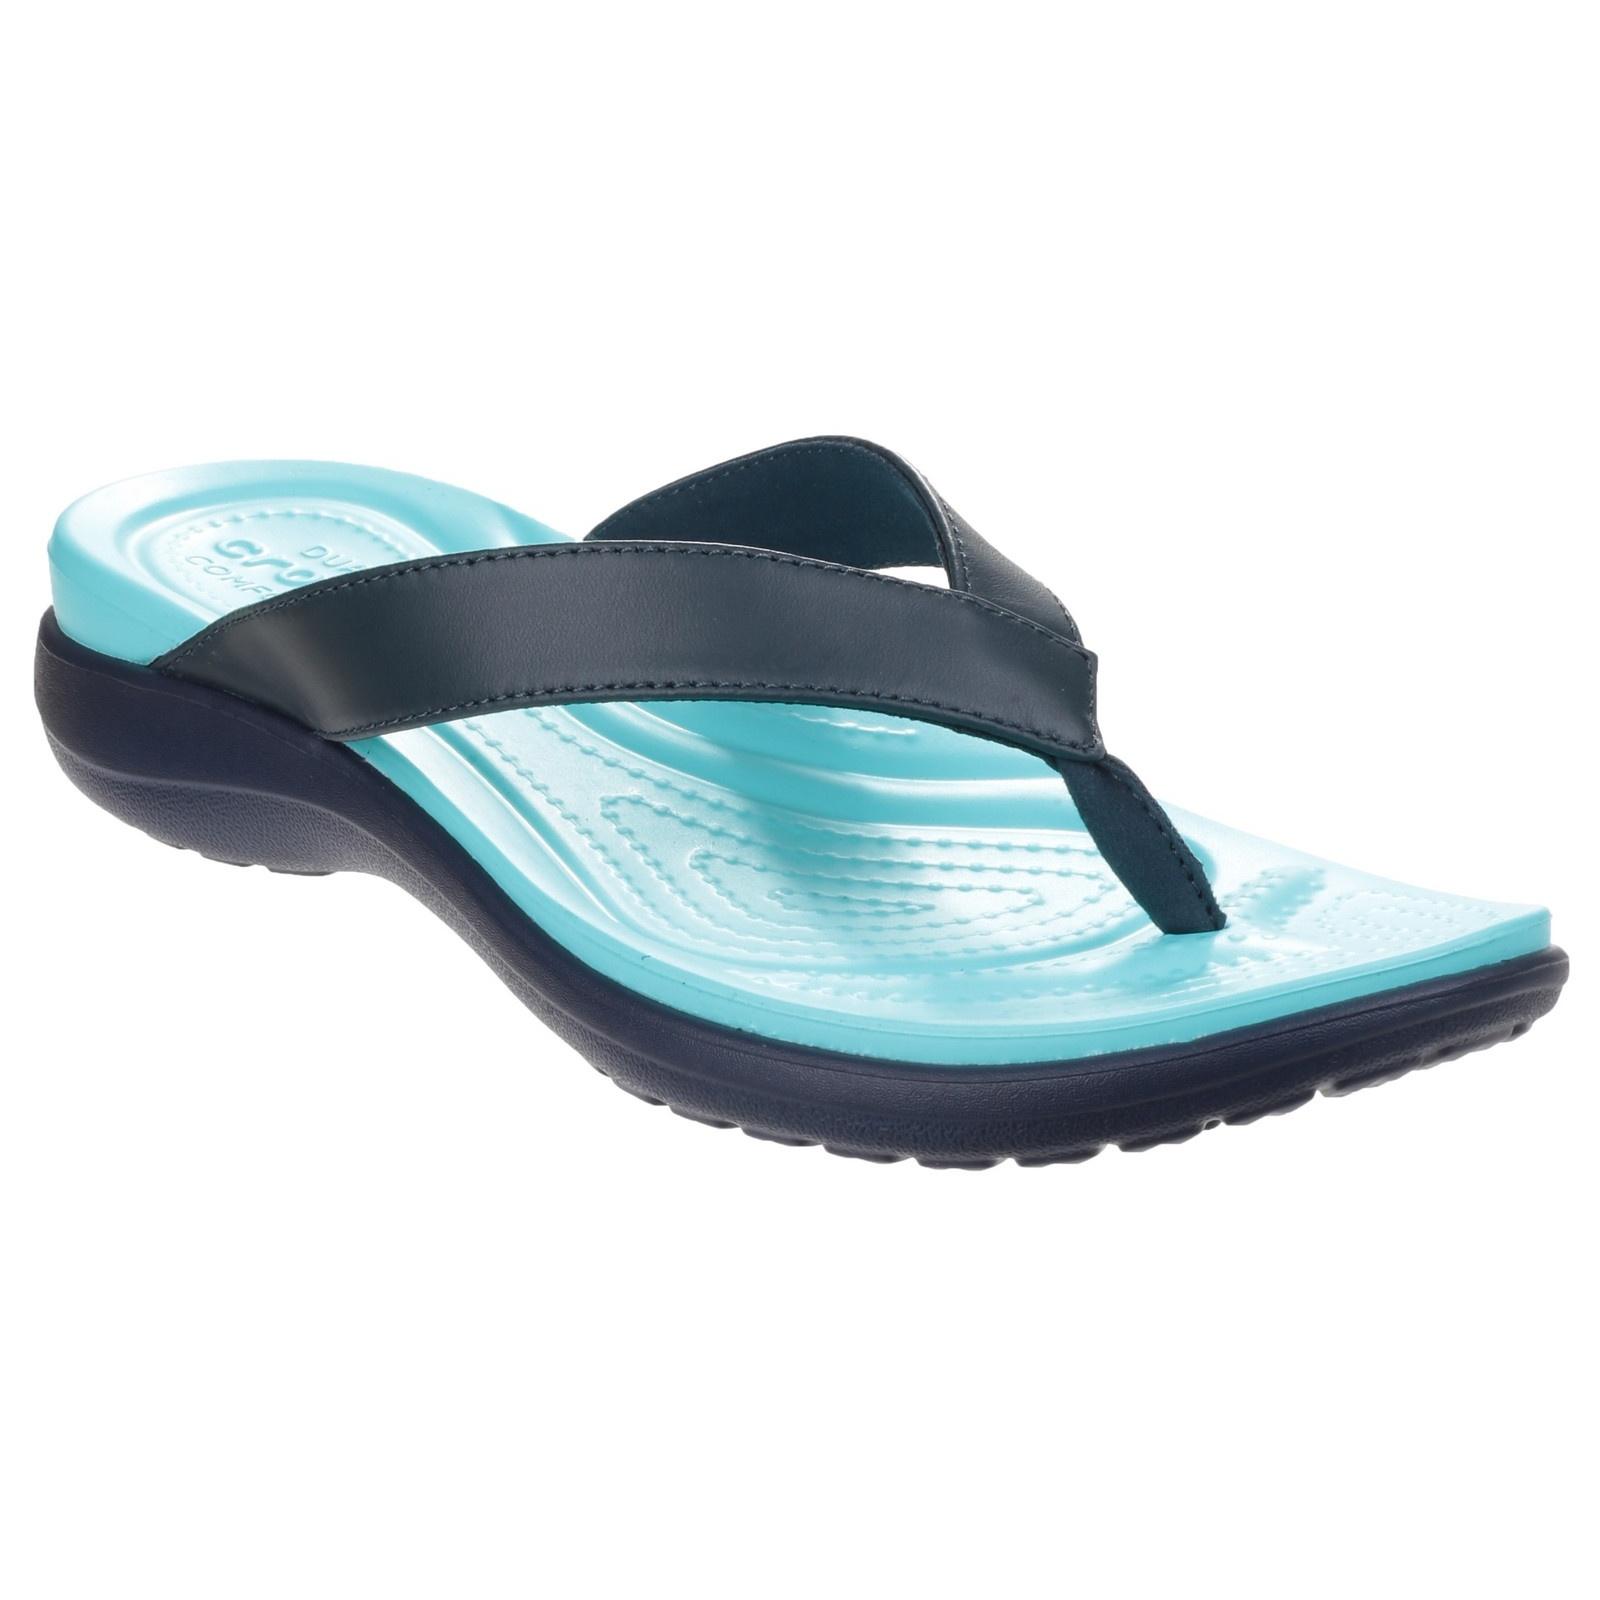 crocs womens ladies capri v summer flip flops. Black Bedroom Furniture Sets. Home Design Ideas